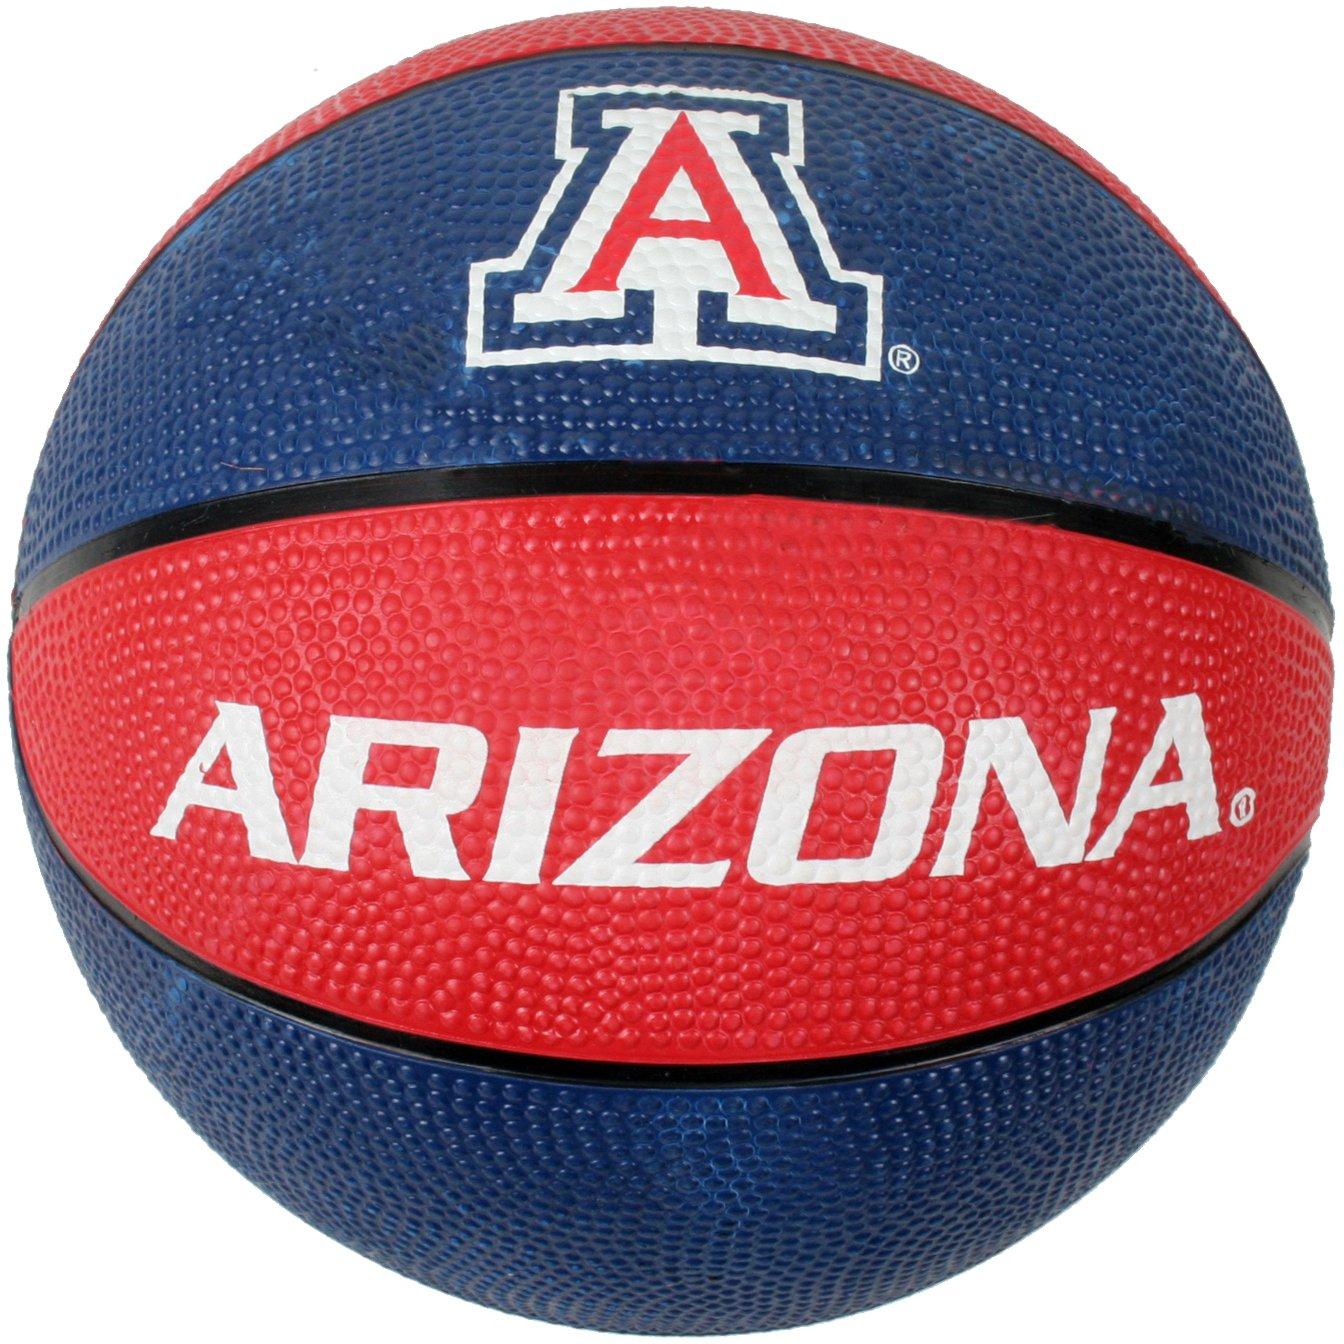 Arizona Wildcats Mini Rubber Basketball B0172IEMK6